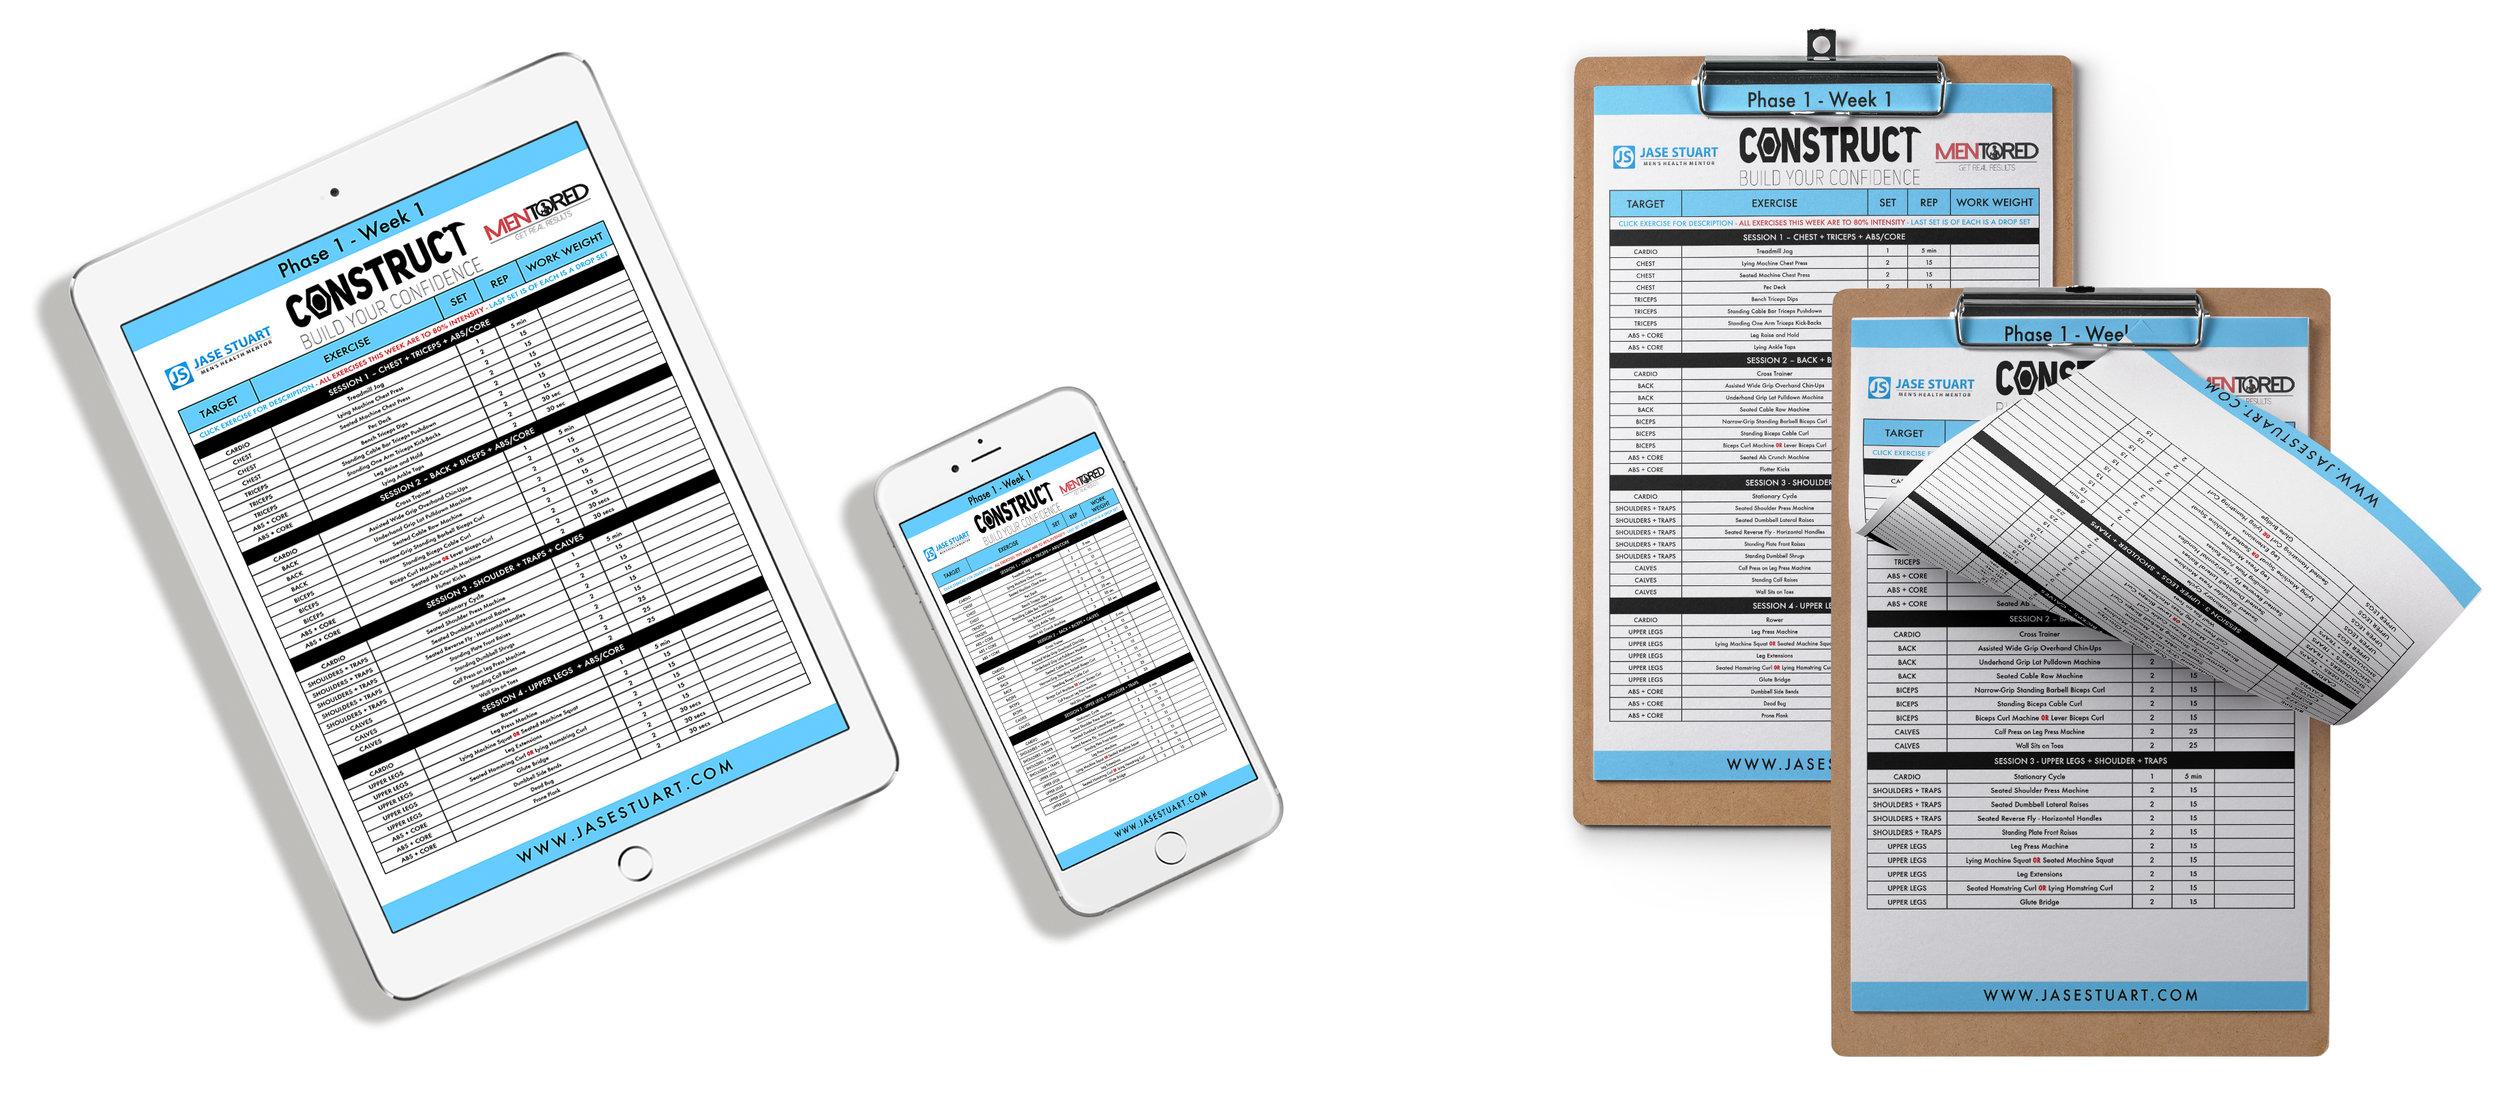 Printable Lifting Log Example - iPad + iPHONE + Clip.jpg